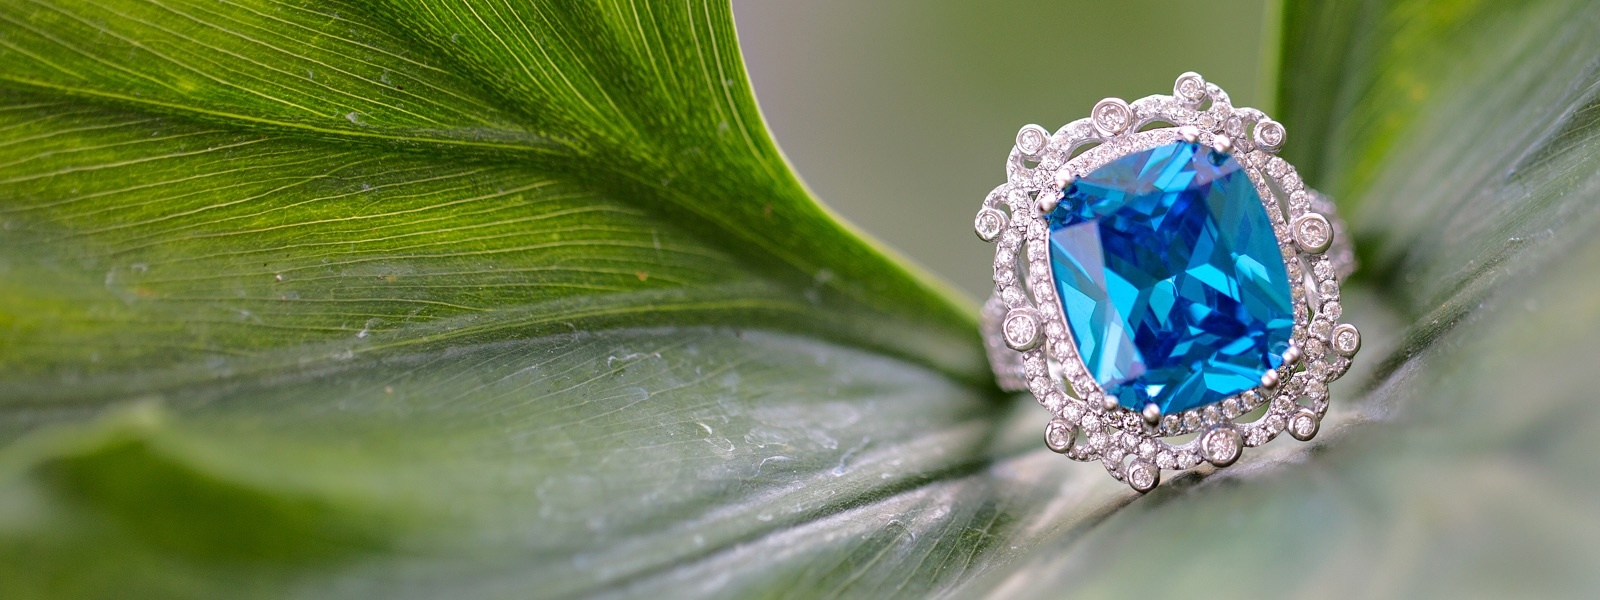 c896eae5a4b7b JTV - Jewelry, Diamonds, Gemstones, Rings, Necklaces, Earrings | JTV.com